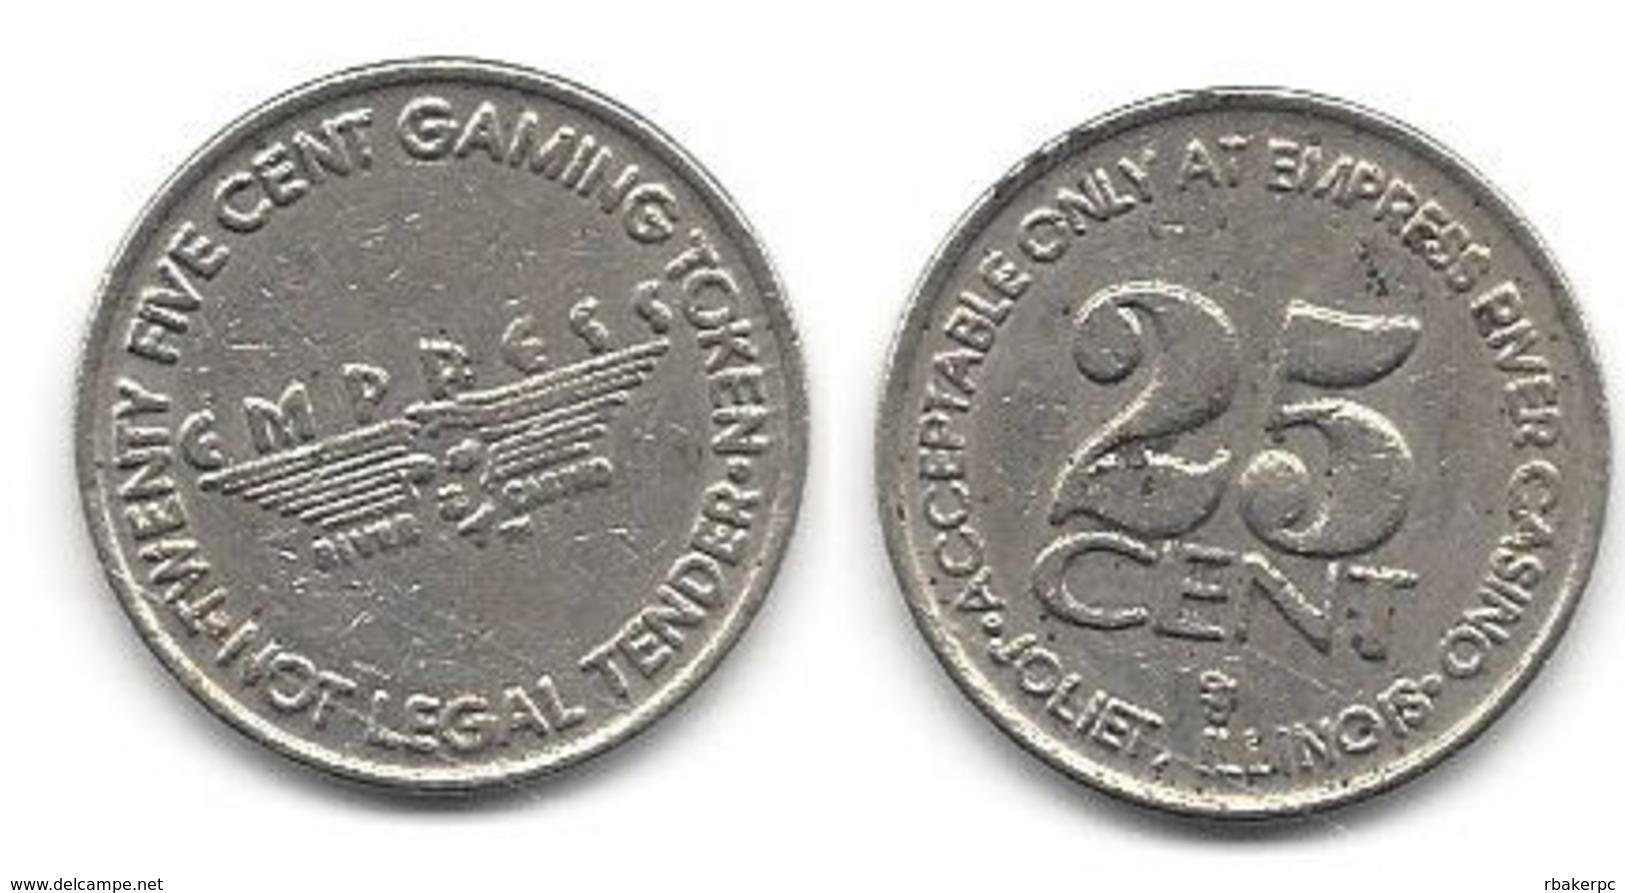 Empress Casino Joliet IL 25 Cent Token - Casino